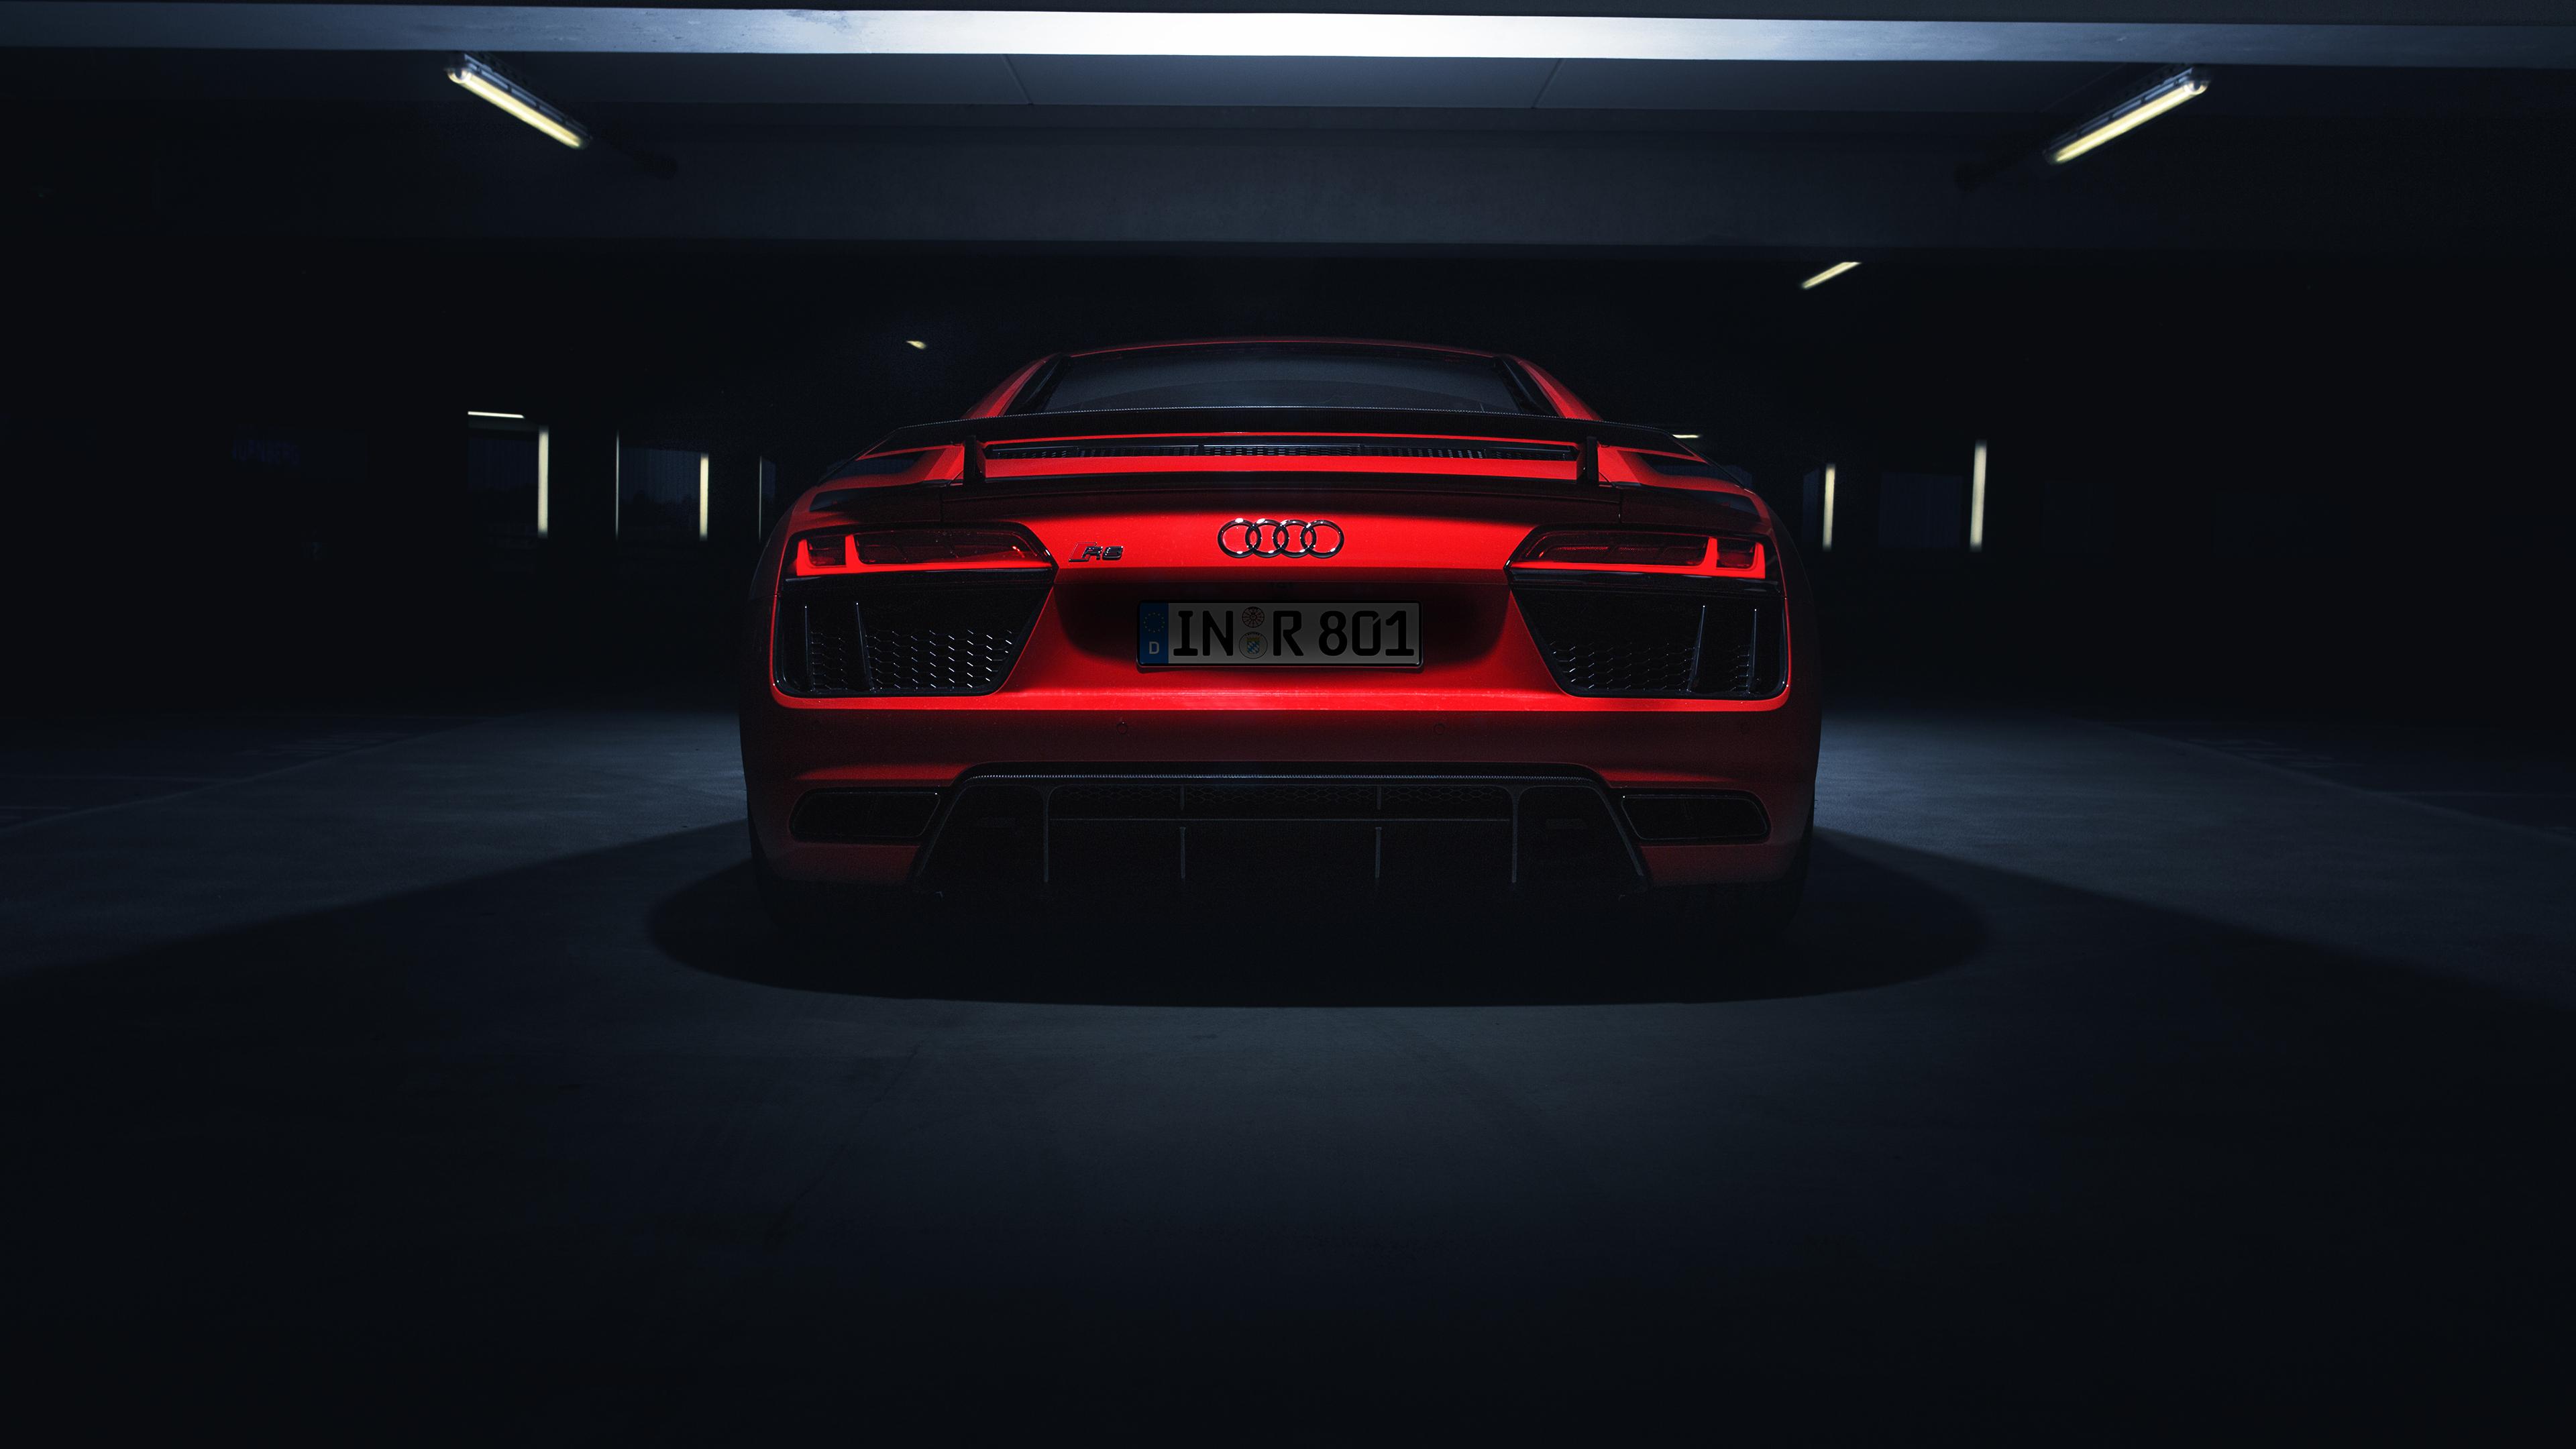 Wallpaper 4k Audi R8 V10 Plus 2018 Rear Look 4k 2018 Cars Wallpapers